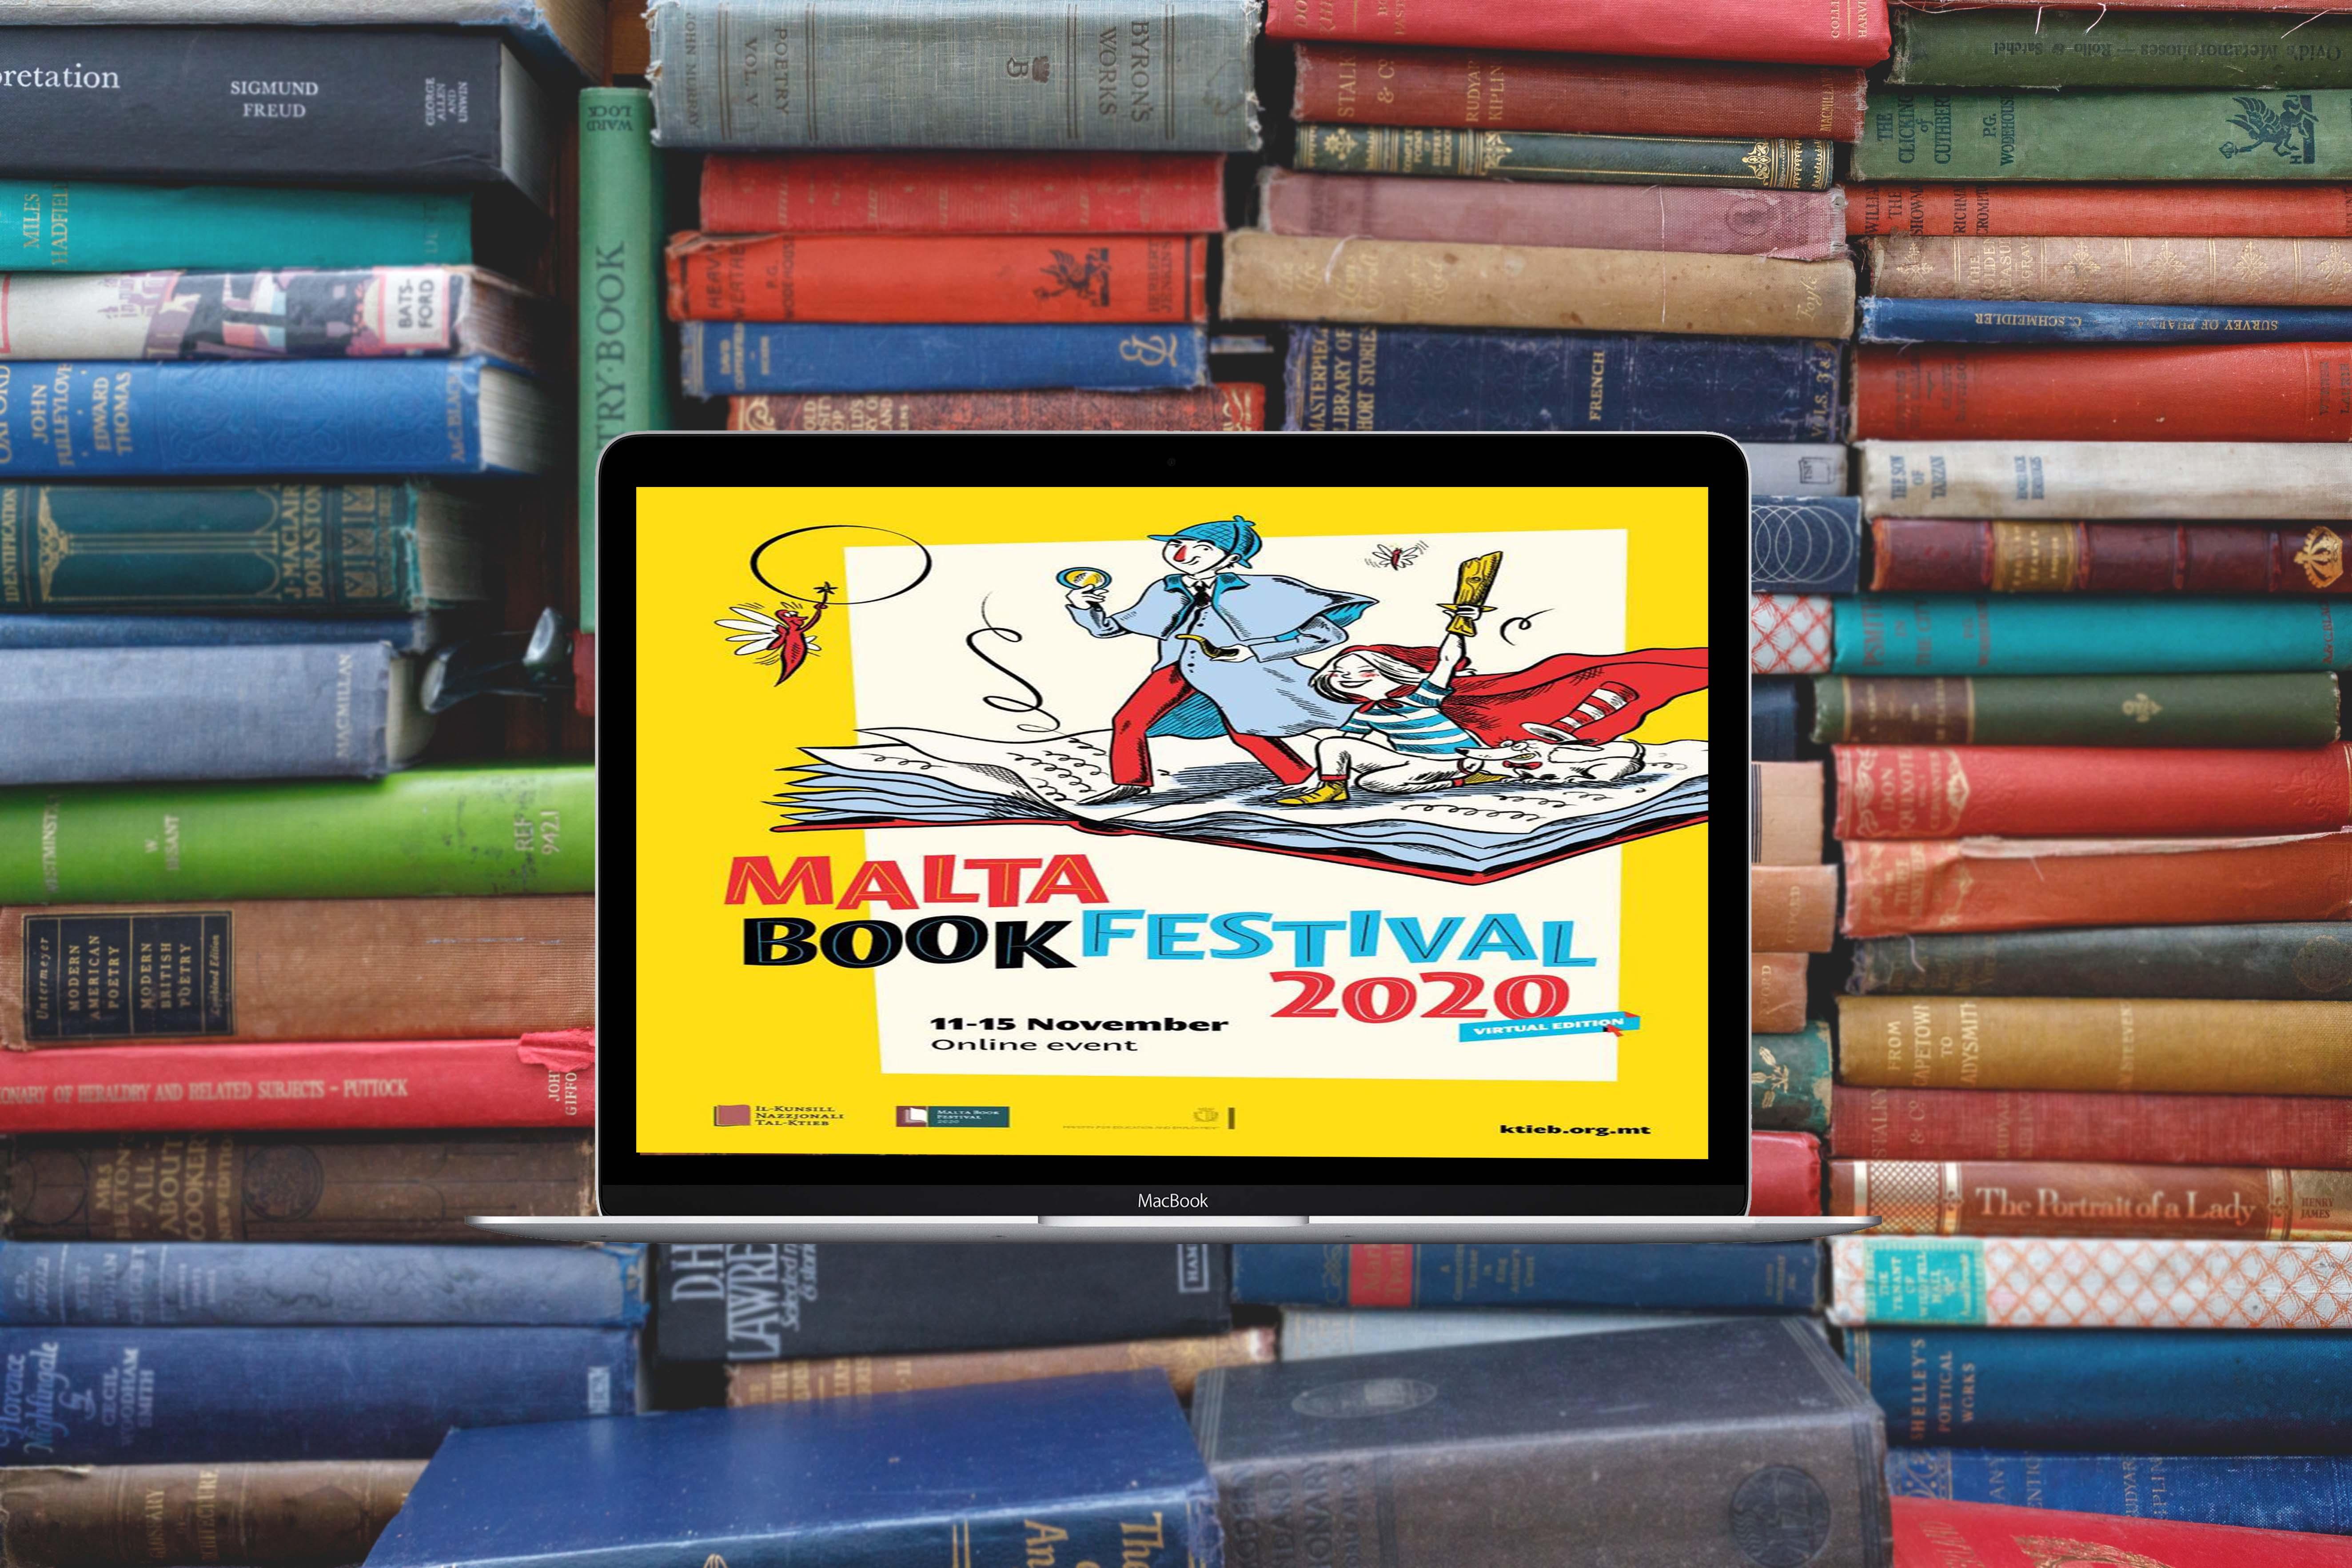 Malta Book Festival going online this season